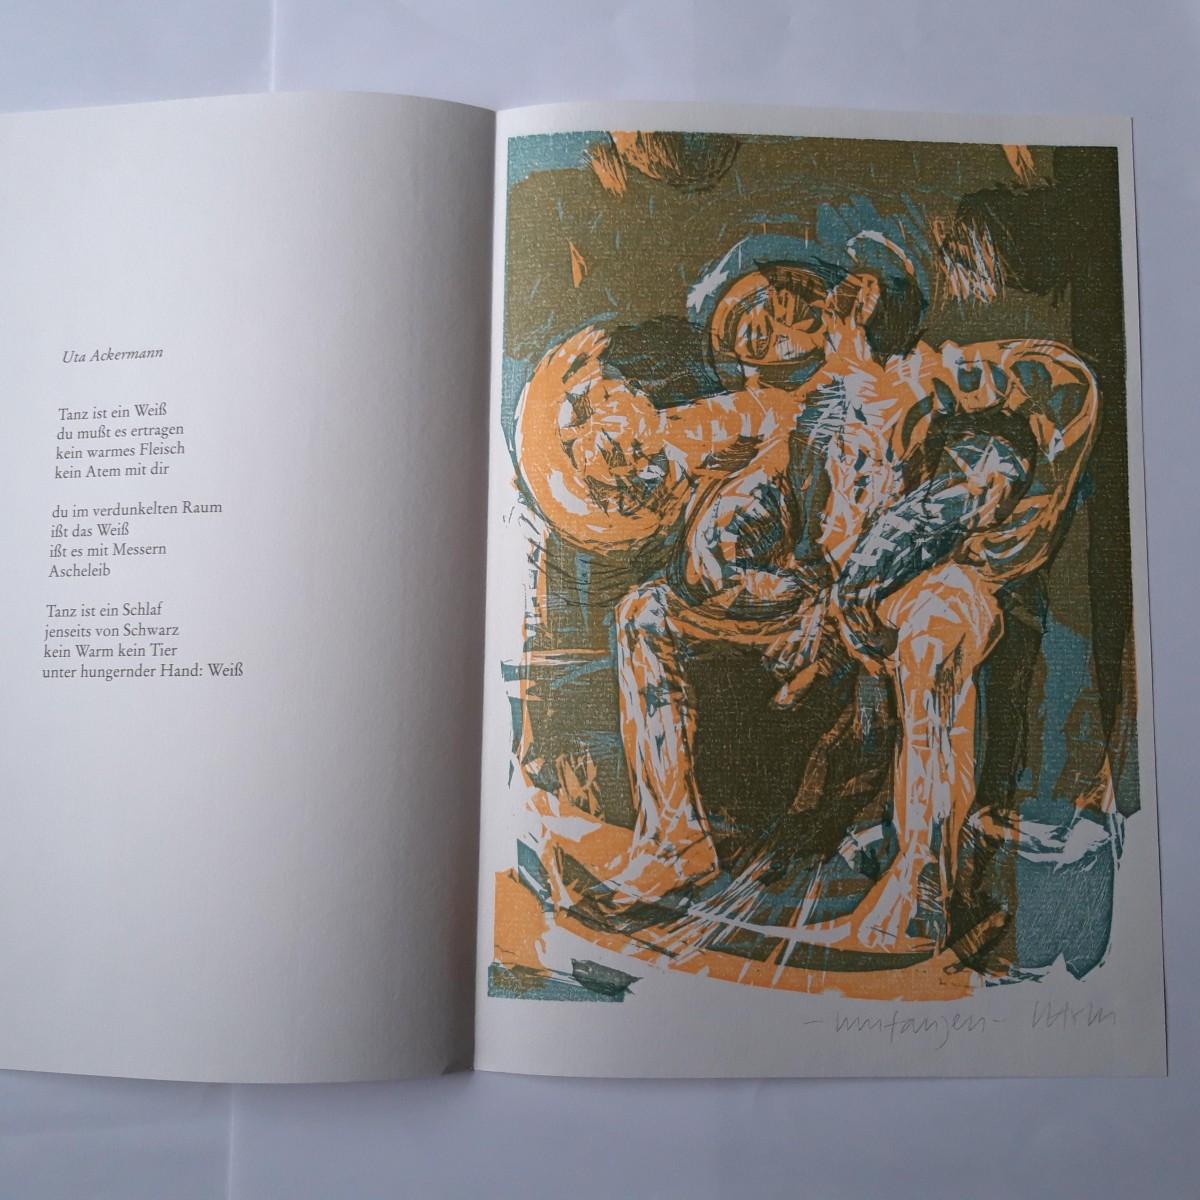 Susann Hoch - HOLZSCHNITT IN 2 FARBEN ZU ACKERMANN-GEDICHT, 1995 kopen? Bied vanaf 75!